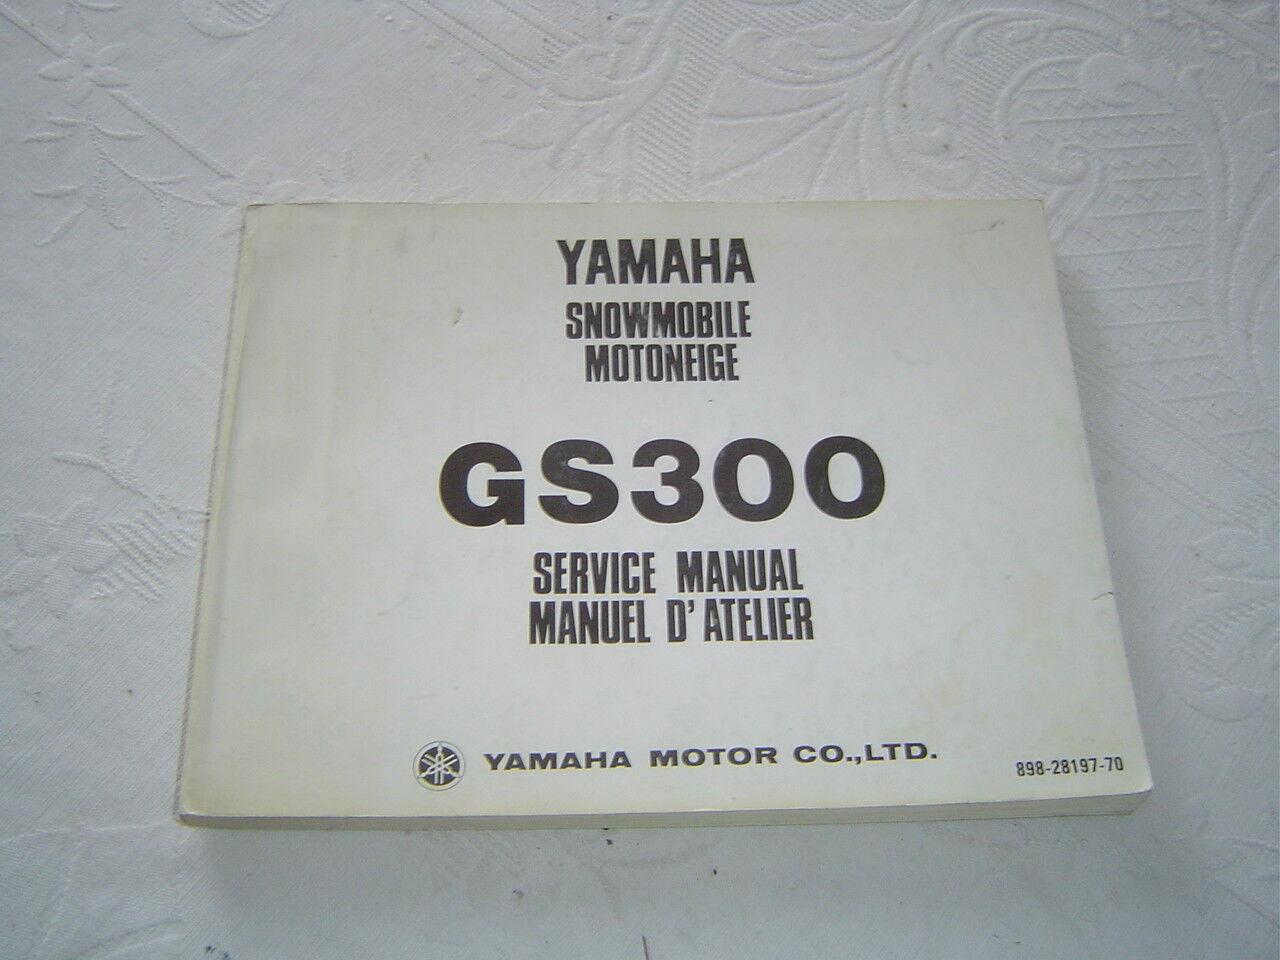 Yamaha GS300  snowmobile service repair shop manual  high quality genuine